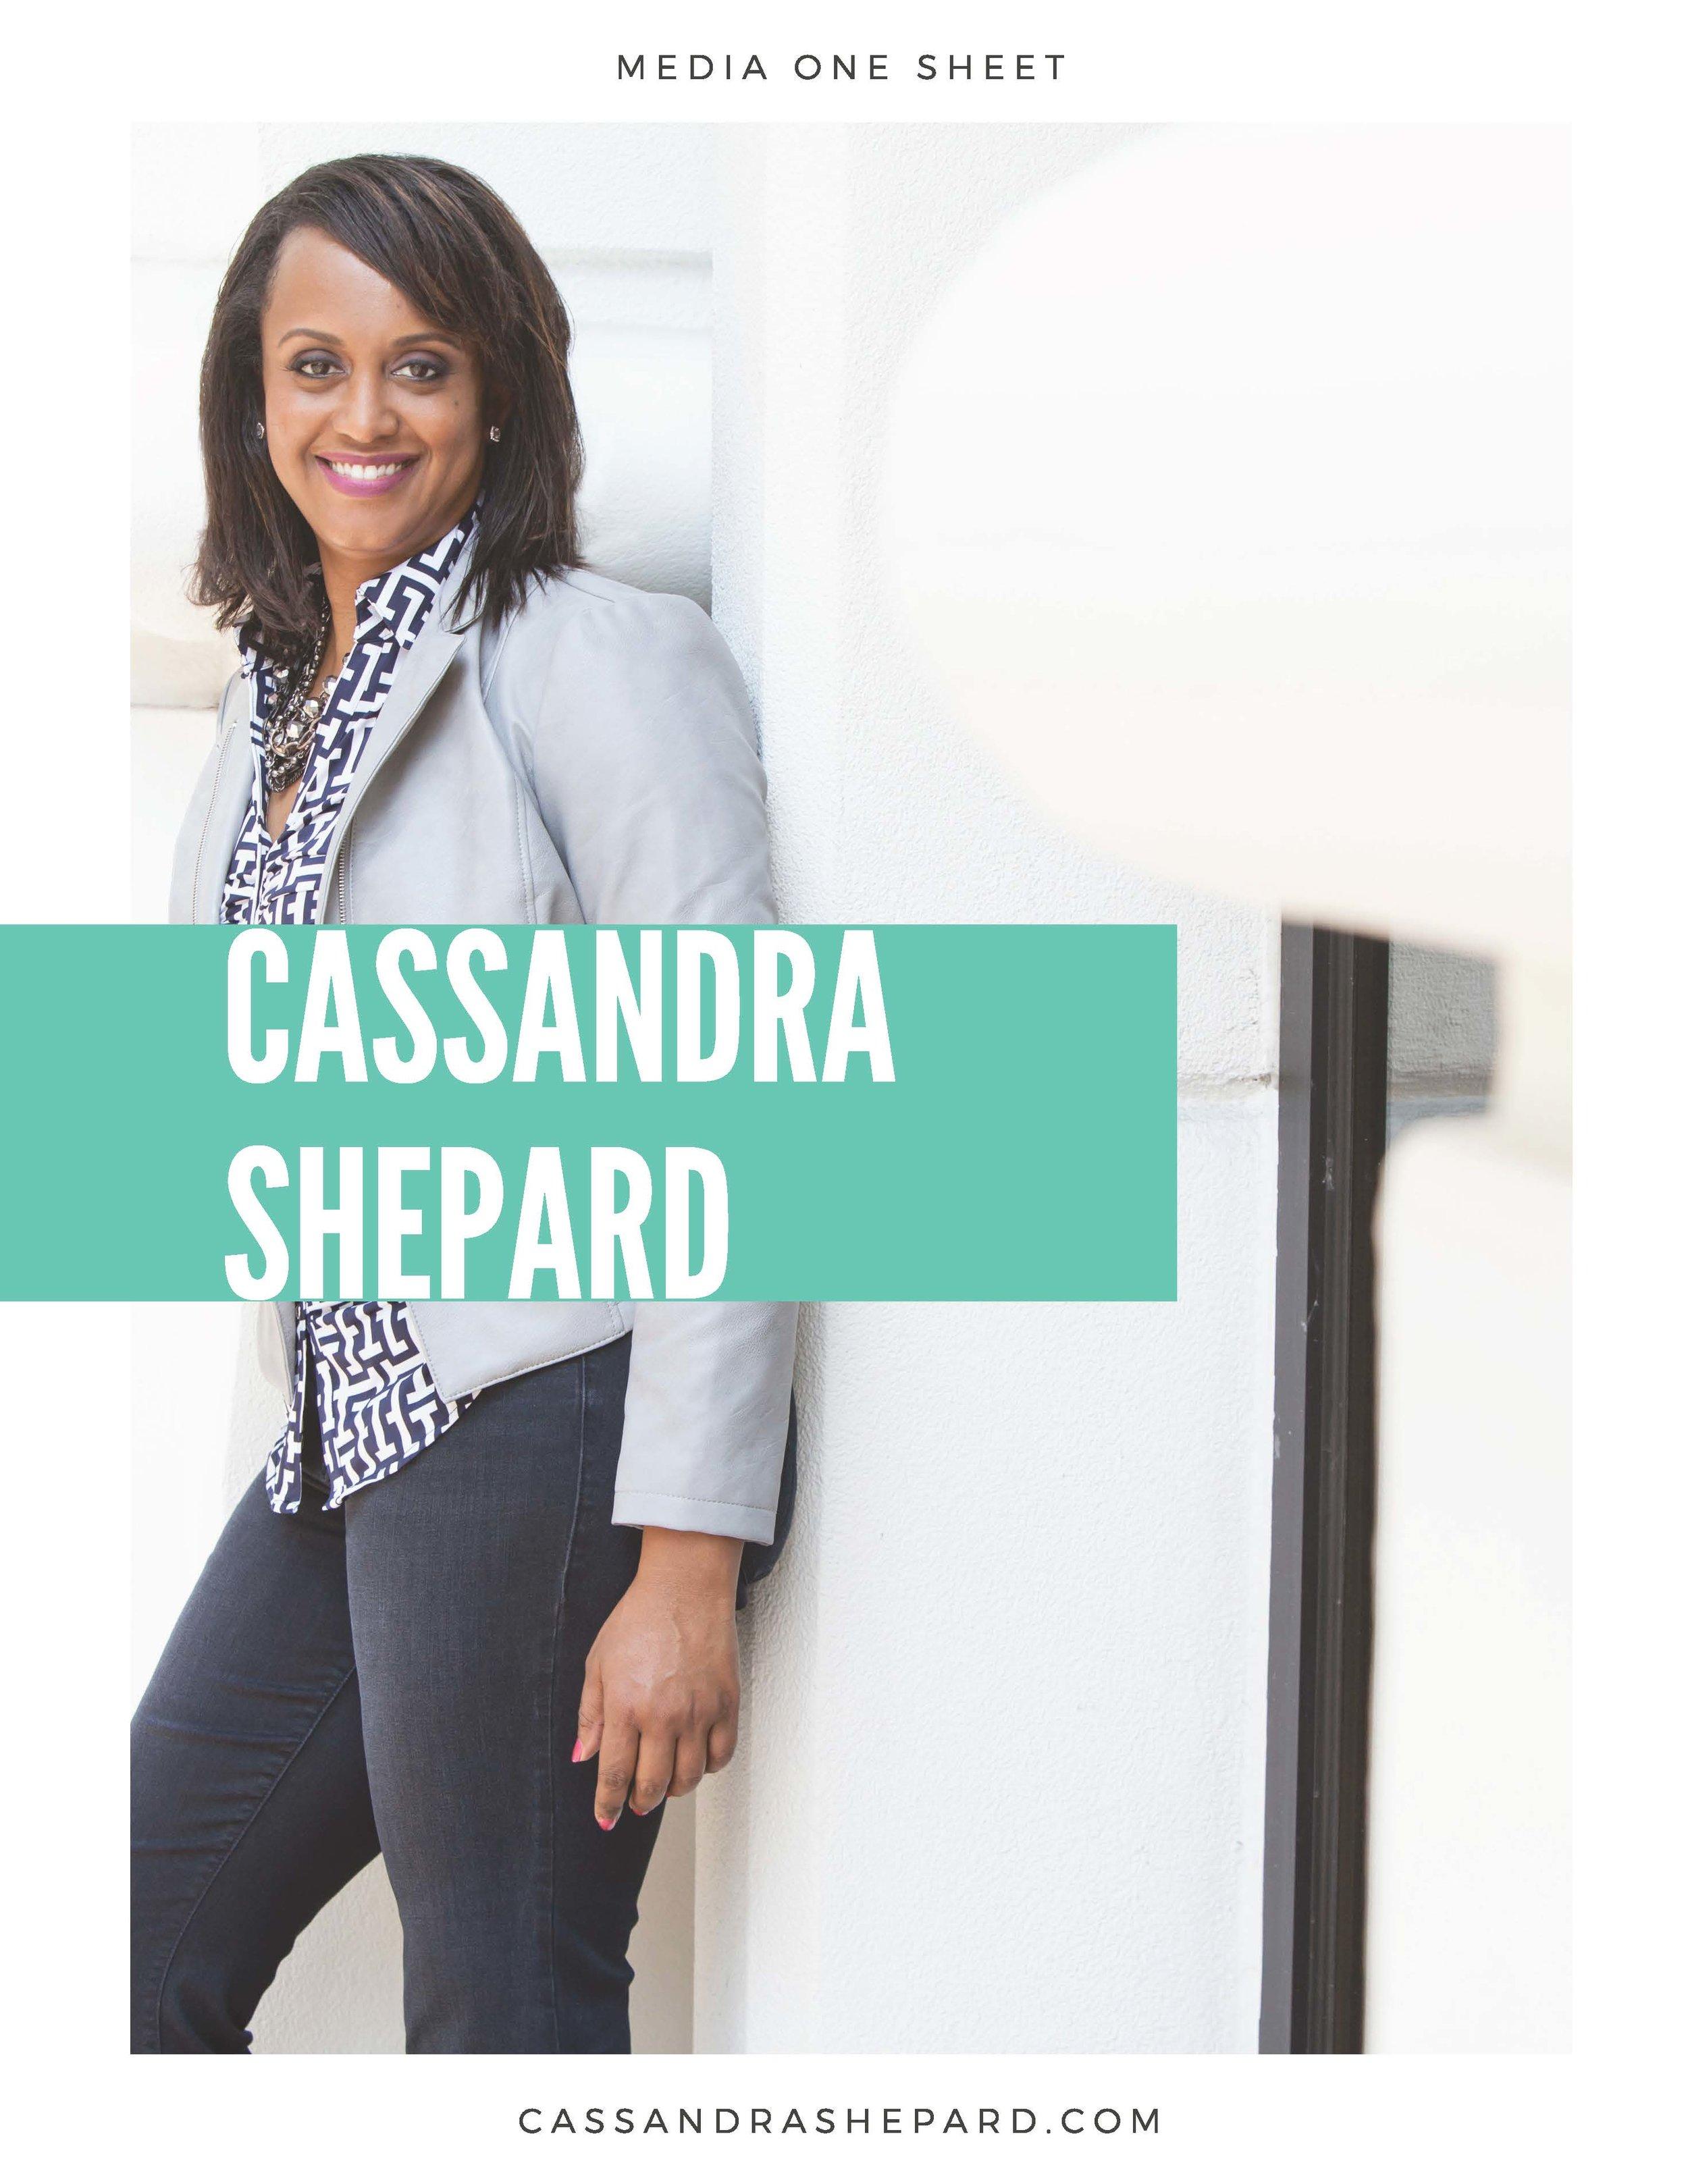 Cassandra+Shepard+Media+One+Sheet+(1).jpg